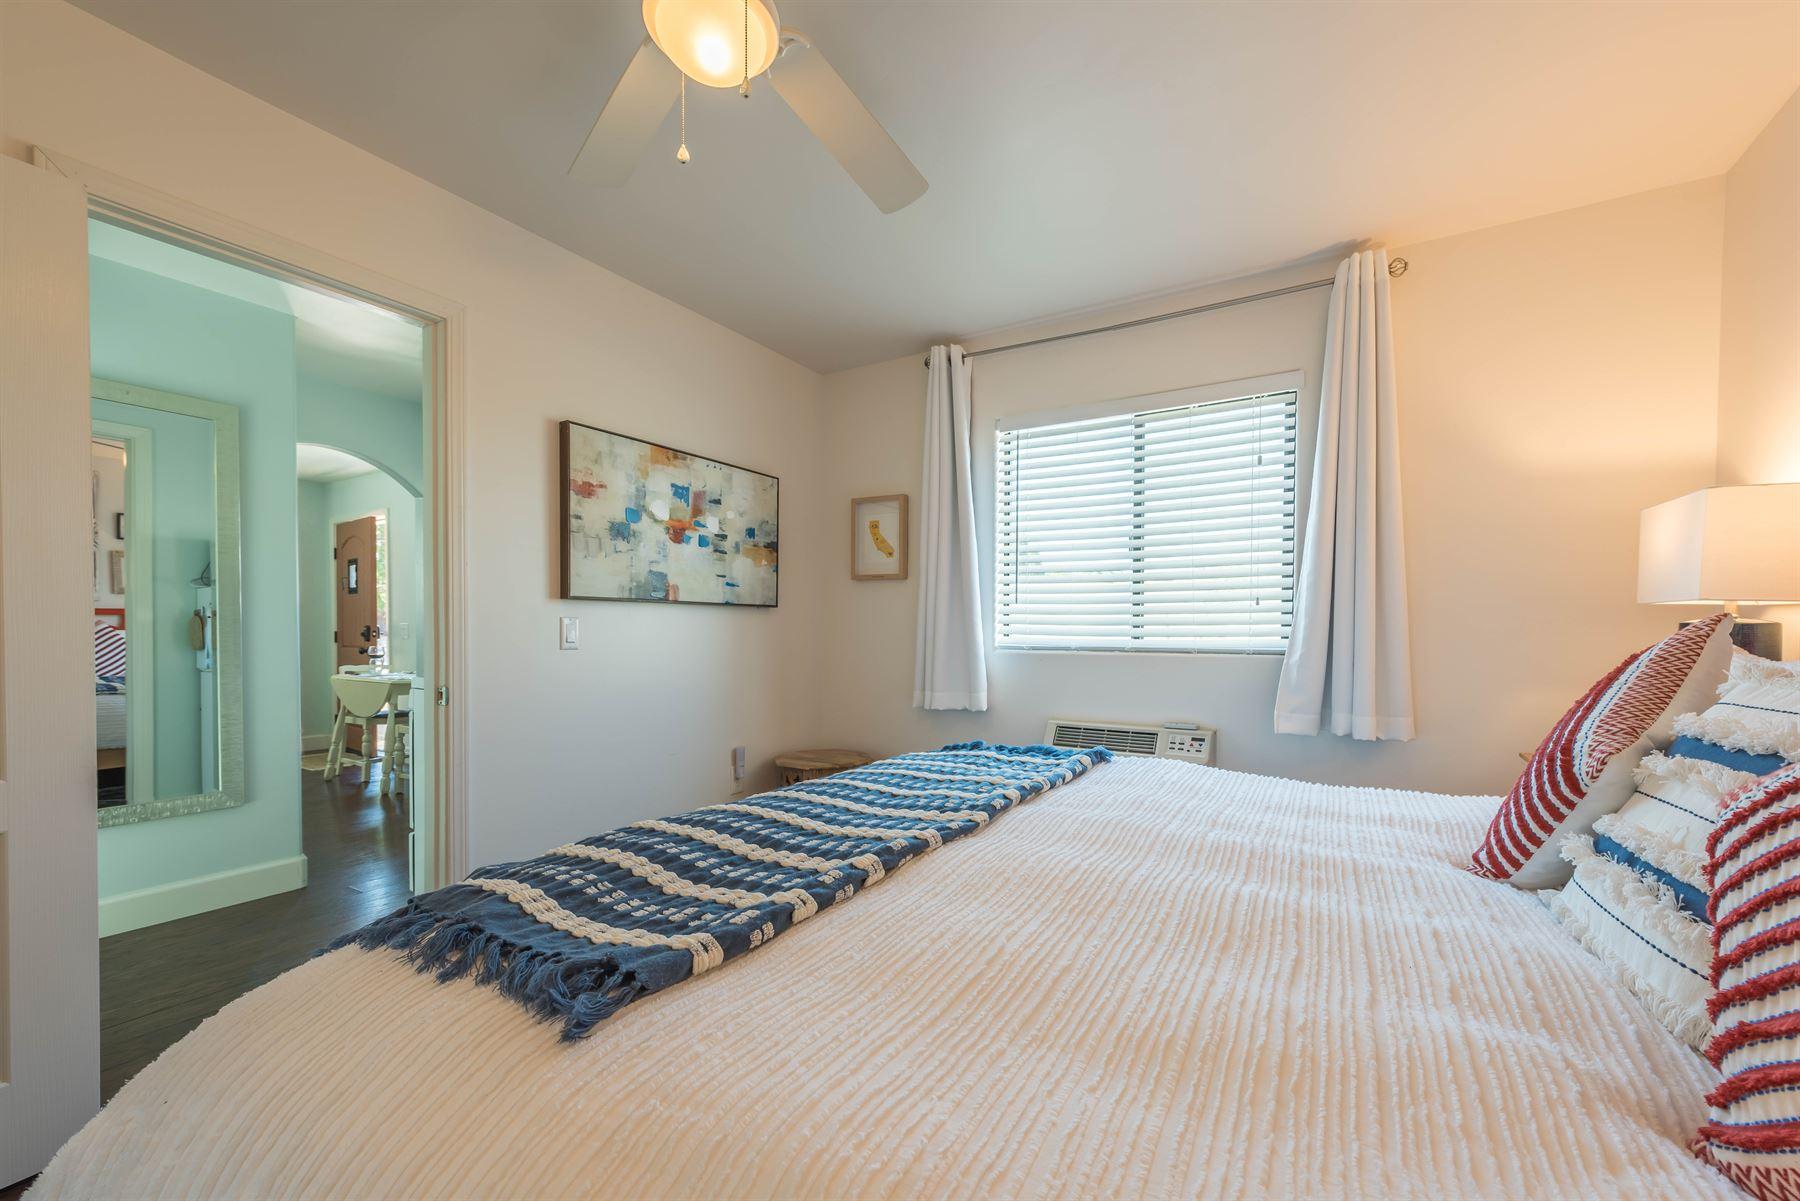 Wine County Casita - Interior - View from Bedroom towards hallway